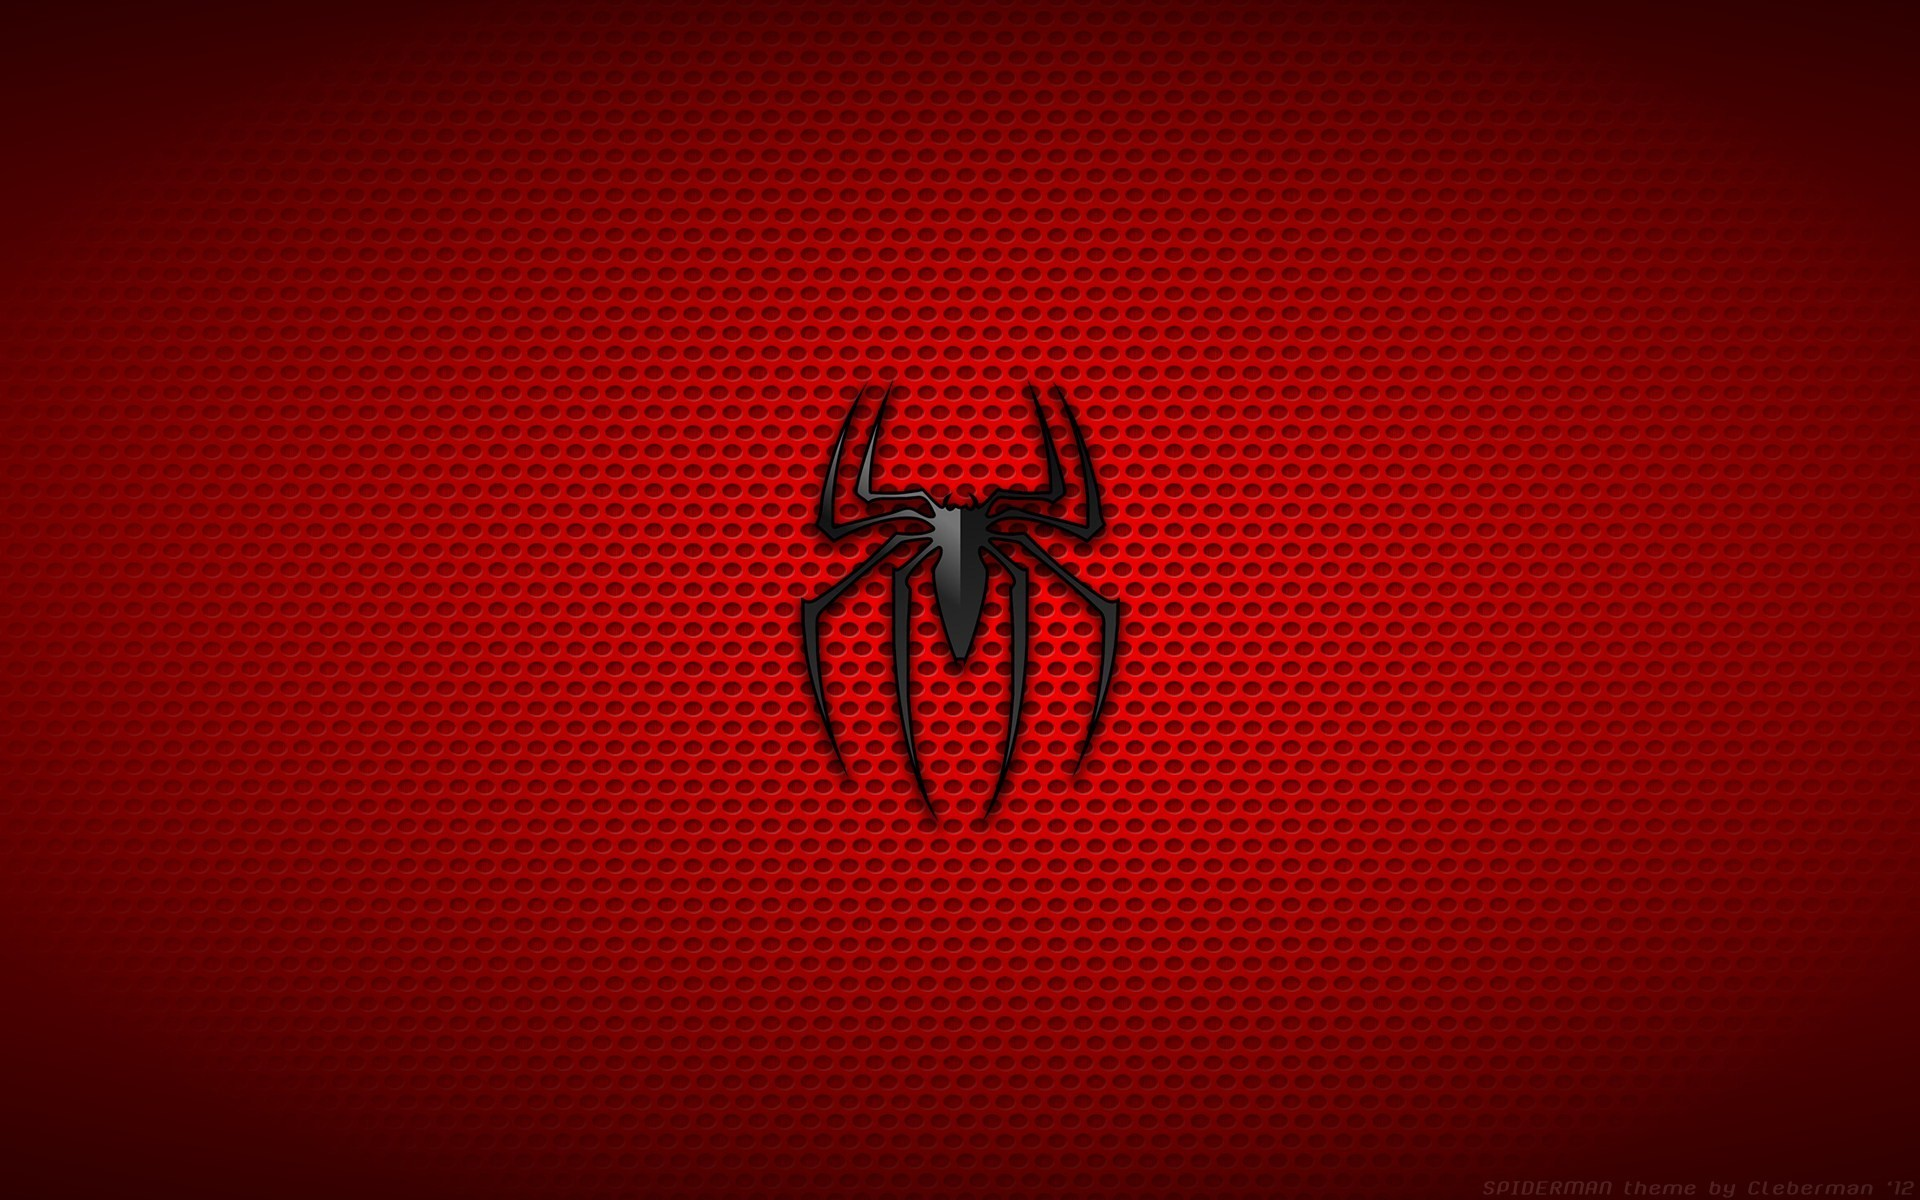 spider man logo art hd wallpaper wallpapers